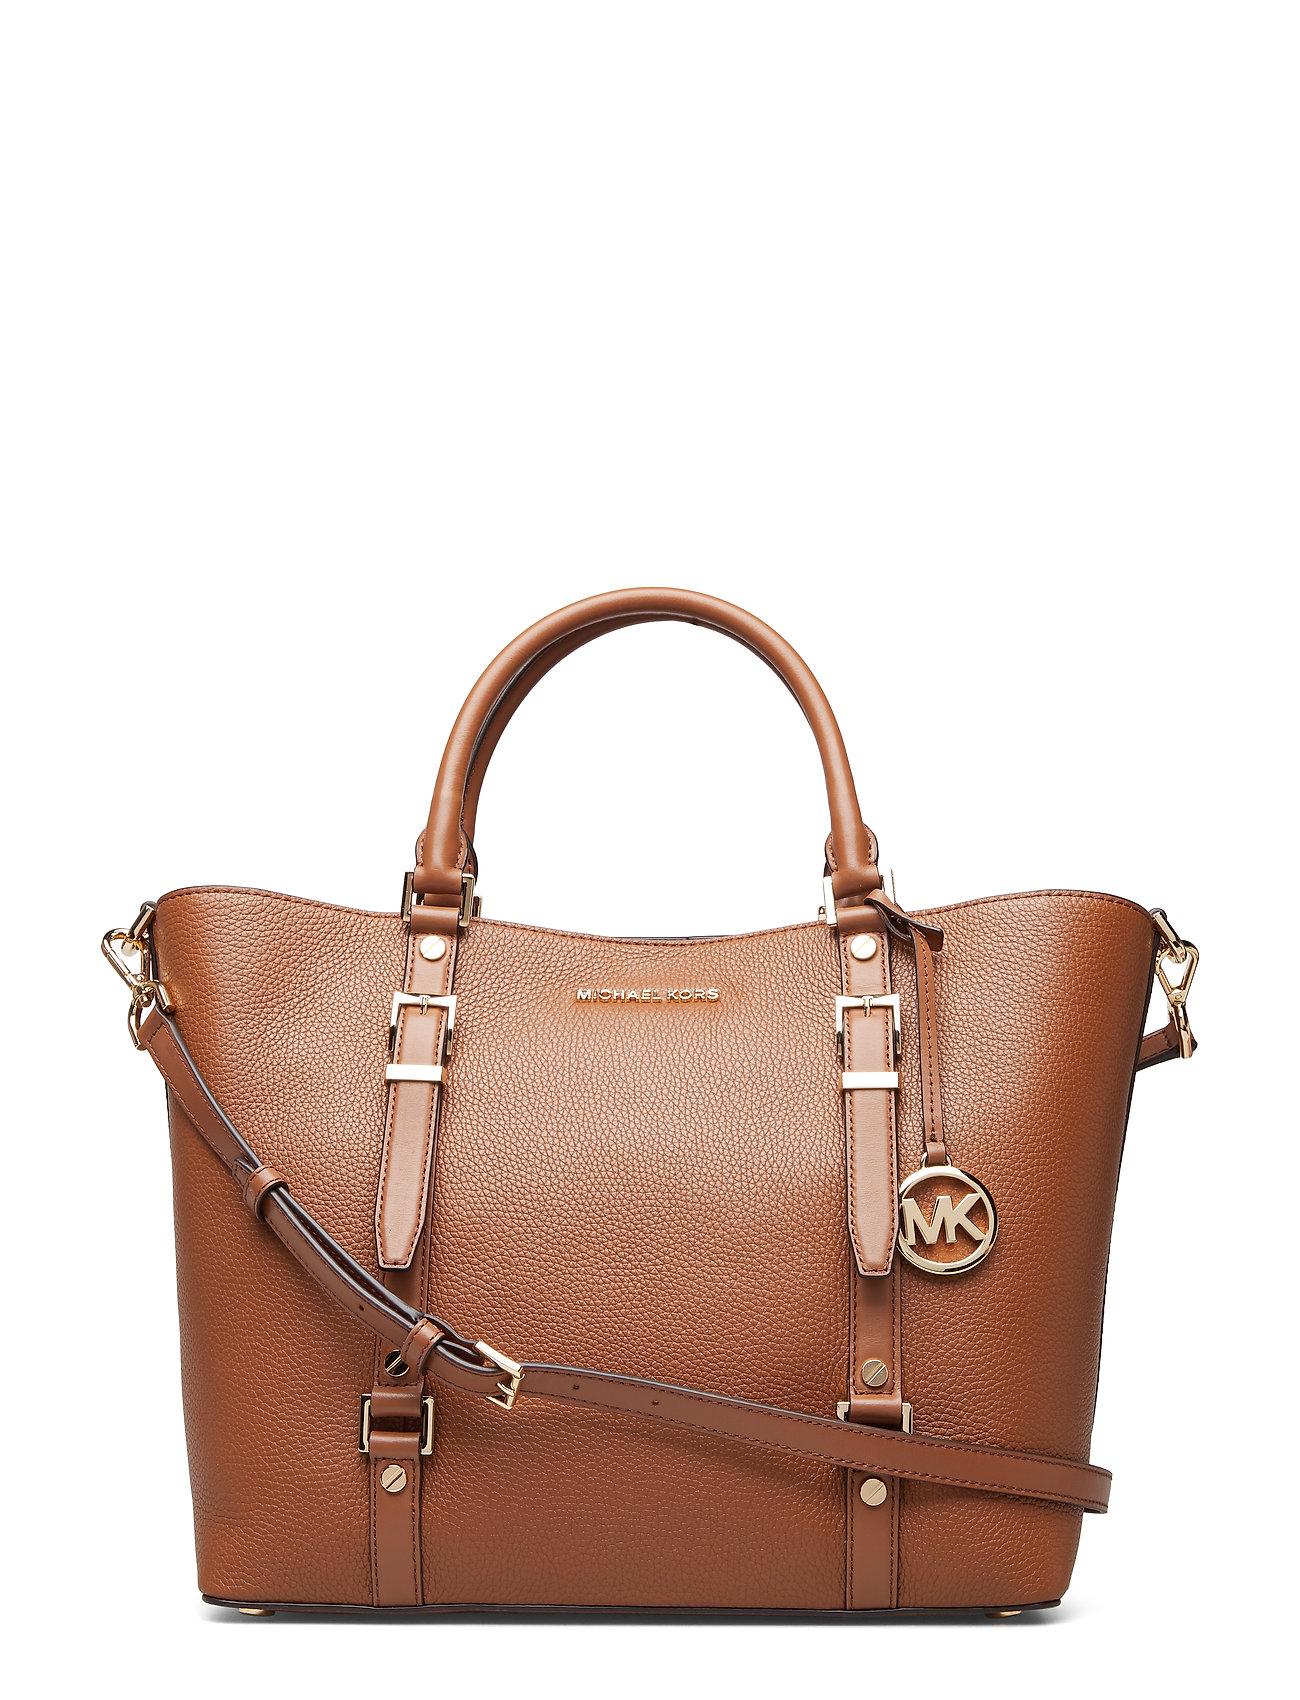 Michael Kors Bags LG GRAB TOTE - LUGGAGE